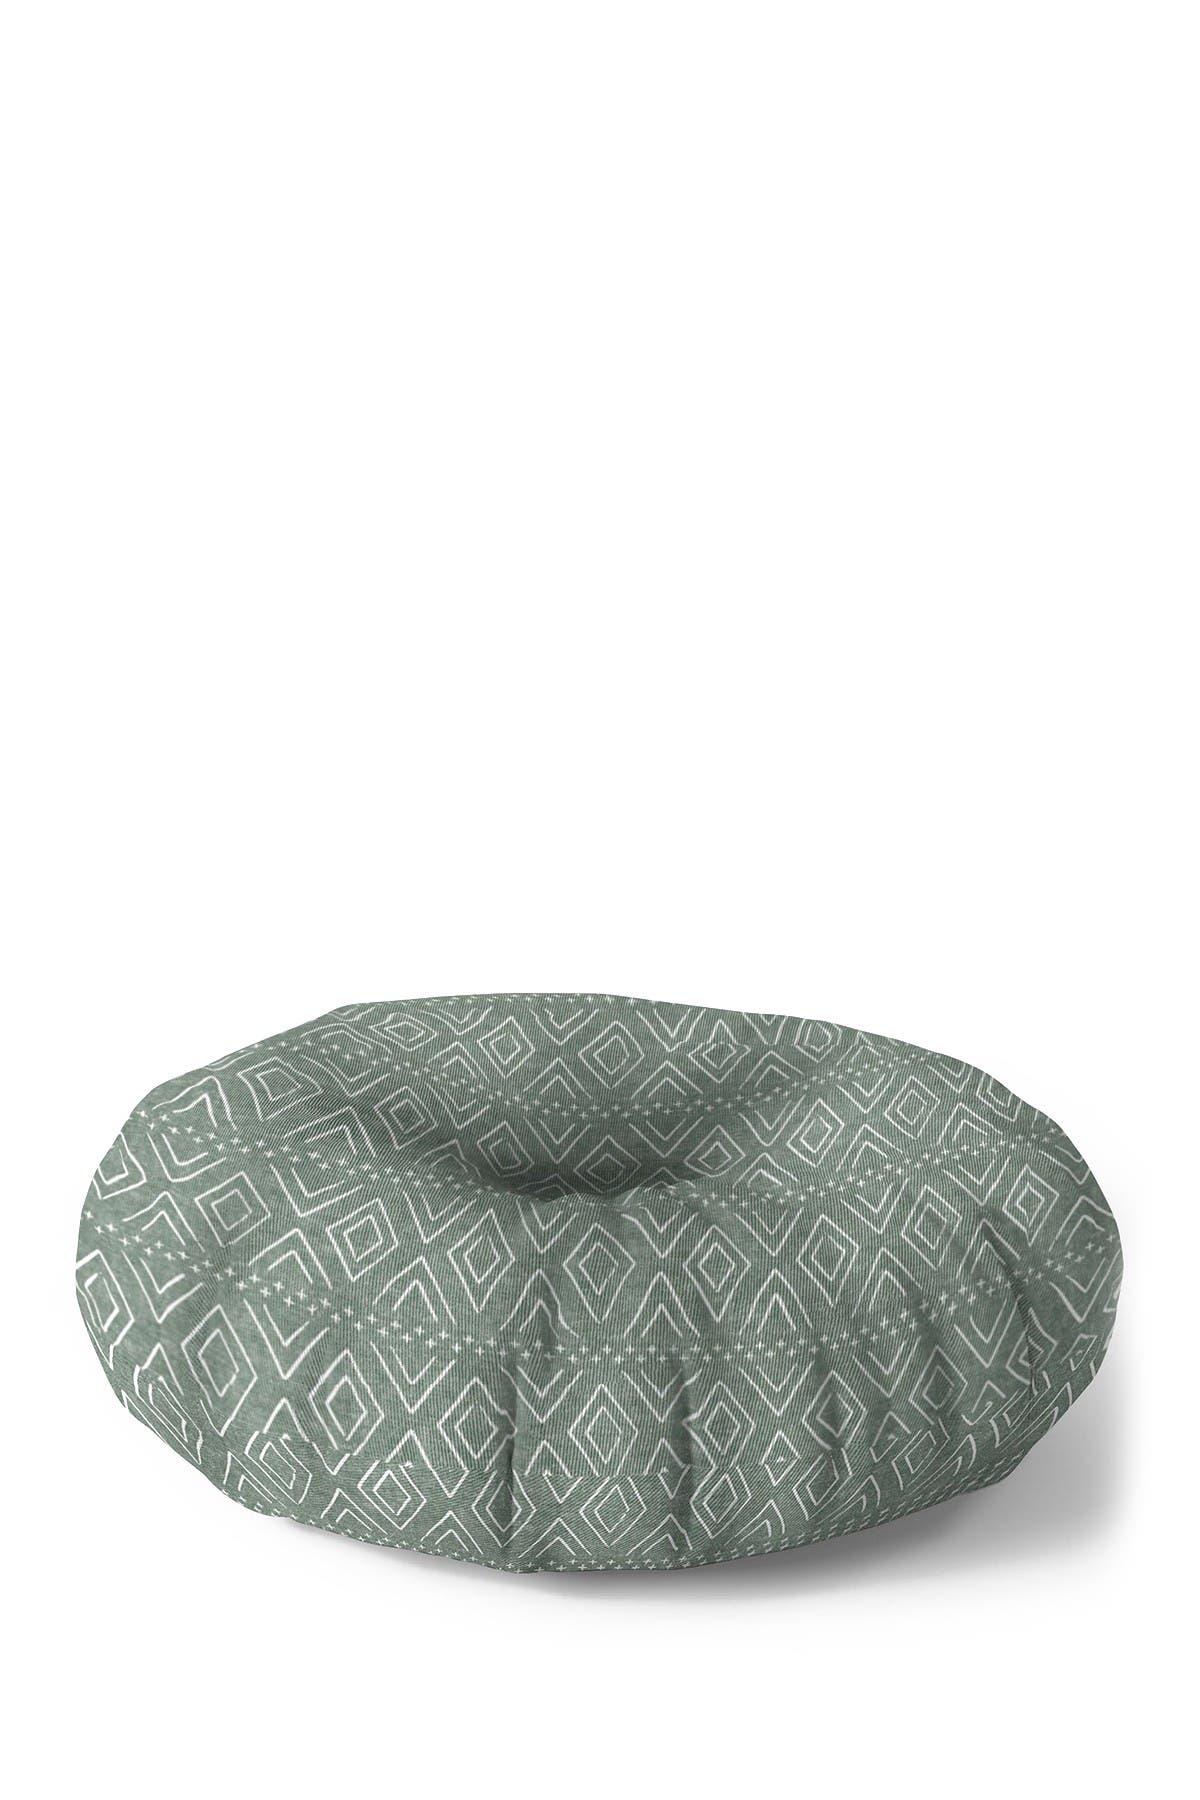 Image of Deny Designs Little Arrow Design Co Farmhouse Diamonds Sage Round Floor Pillow